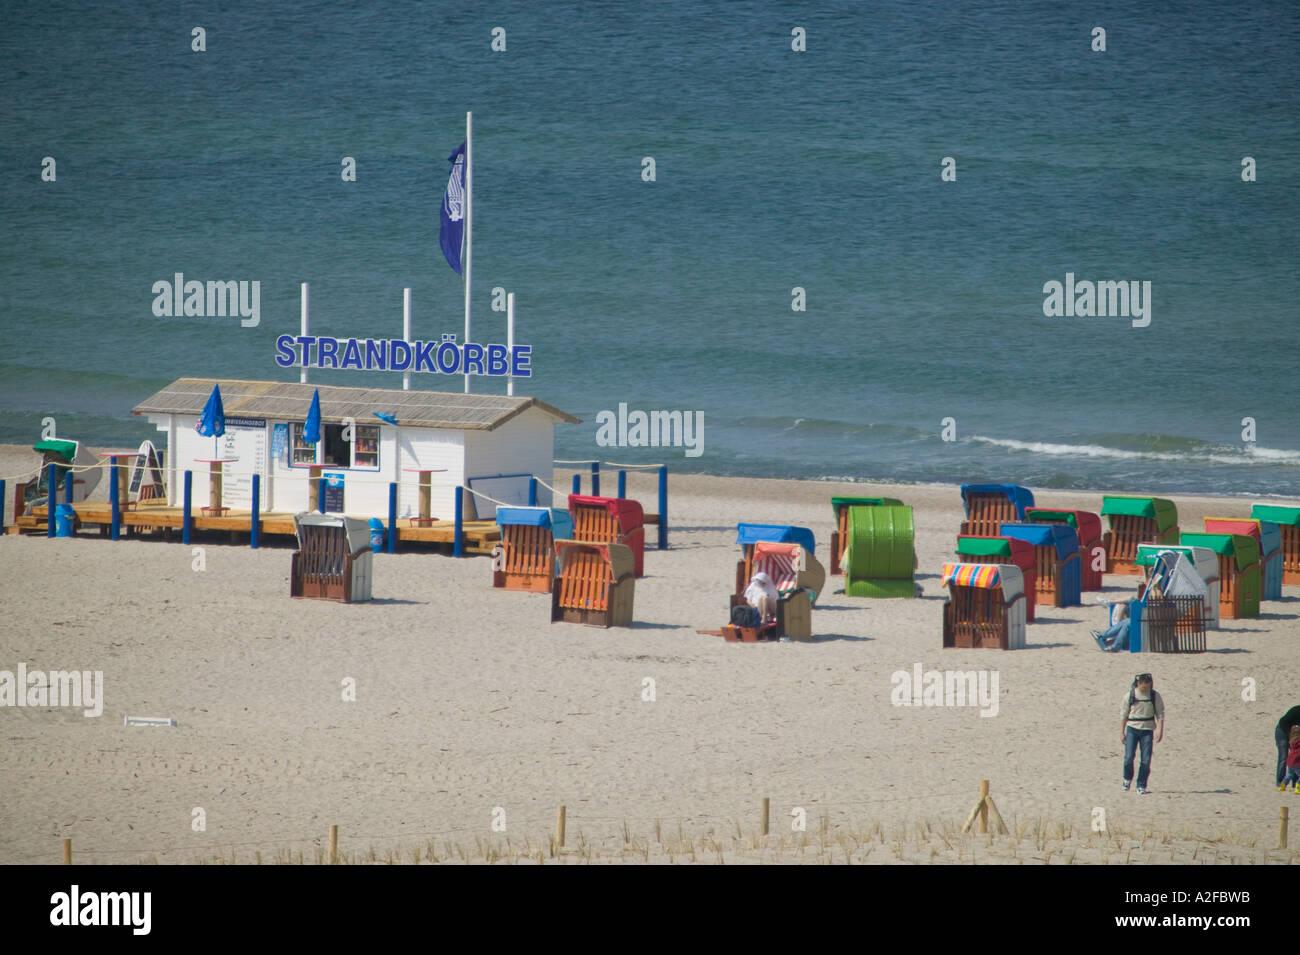 EU, Deutschland, Warnemünde Strand Stockbild